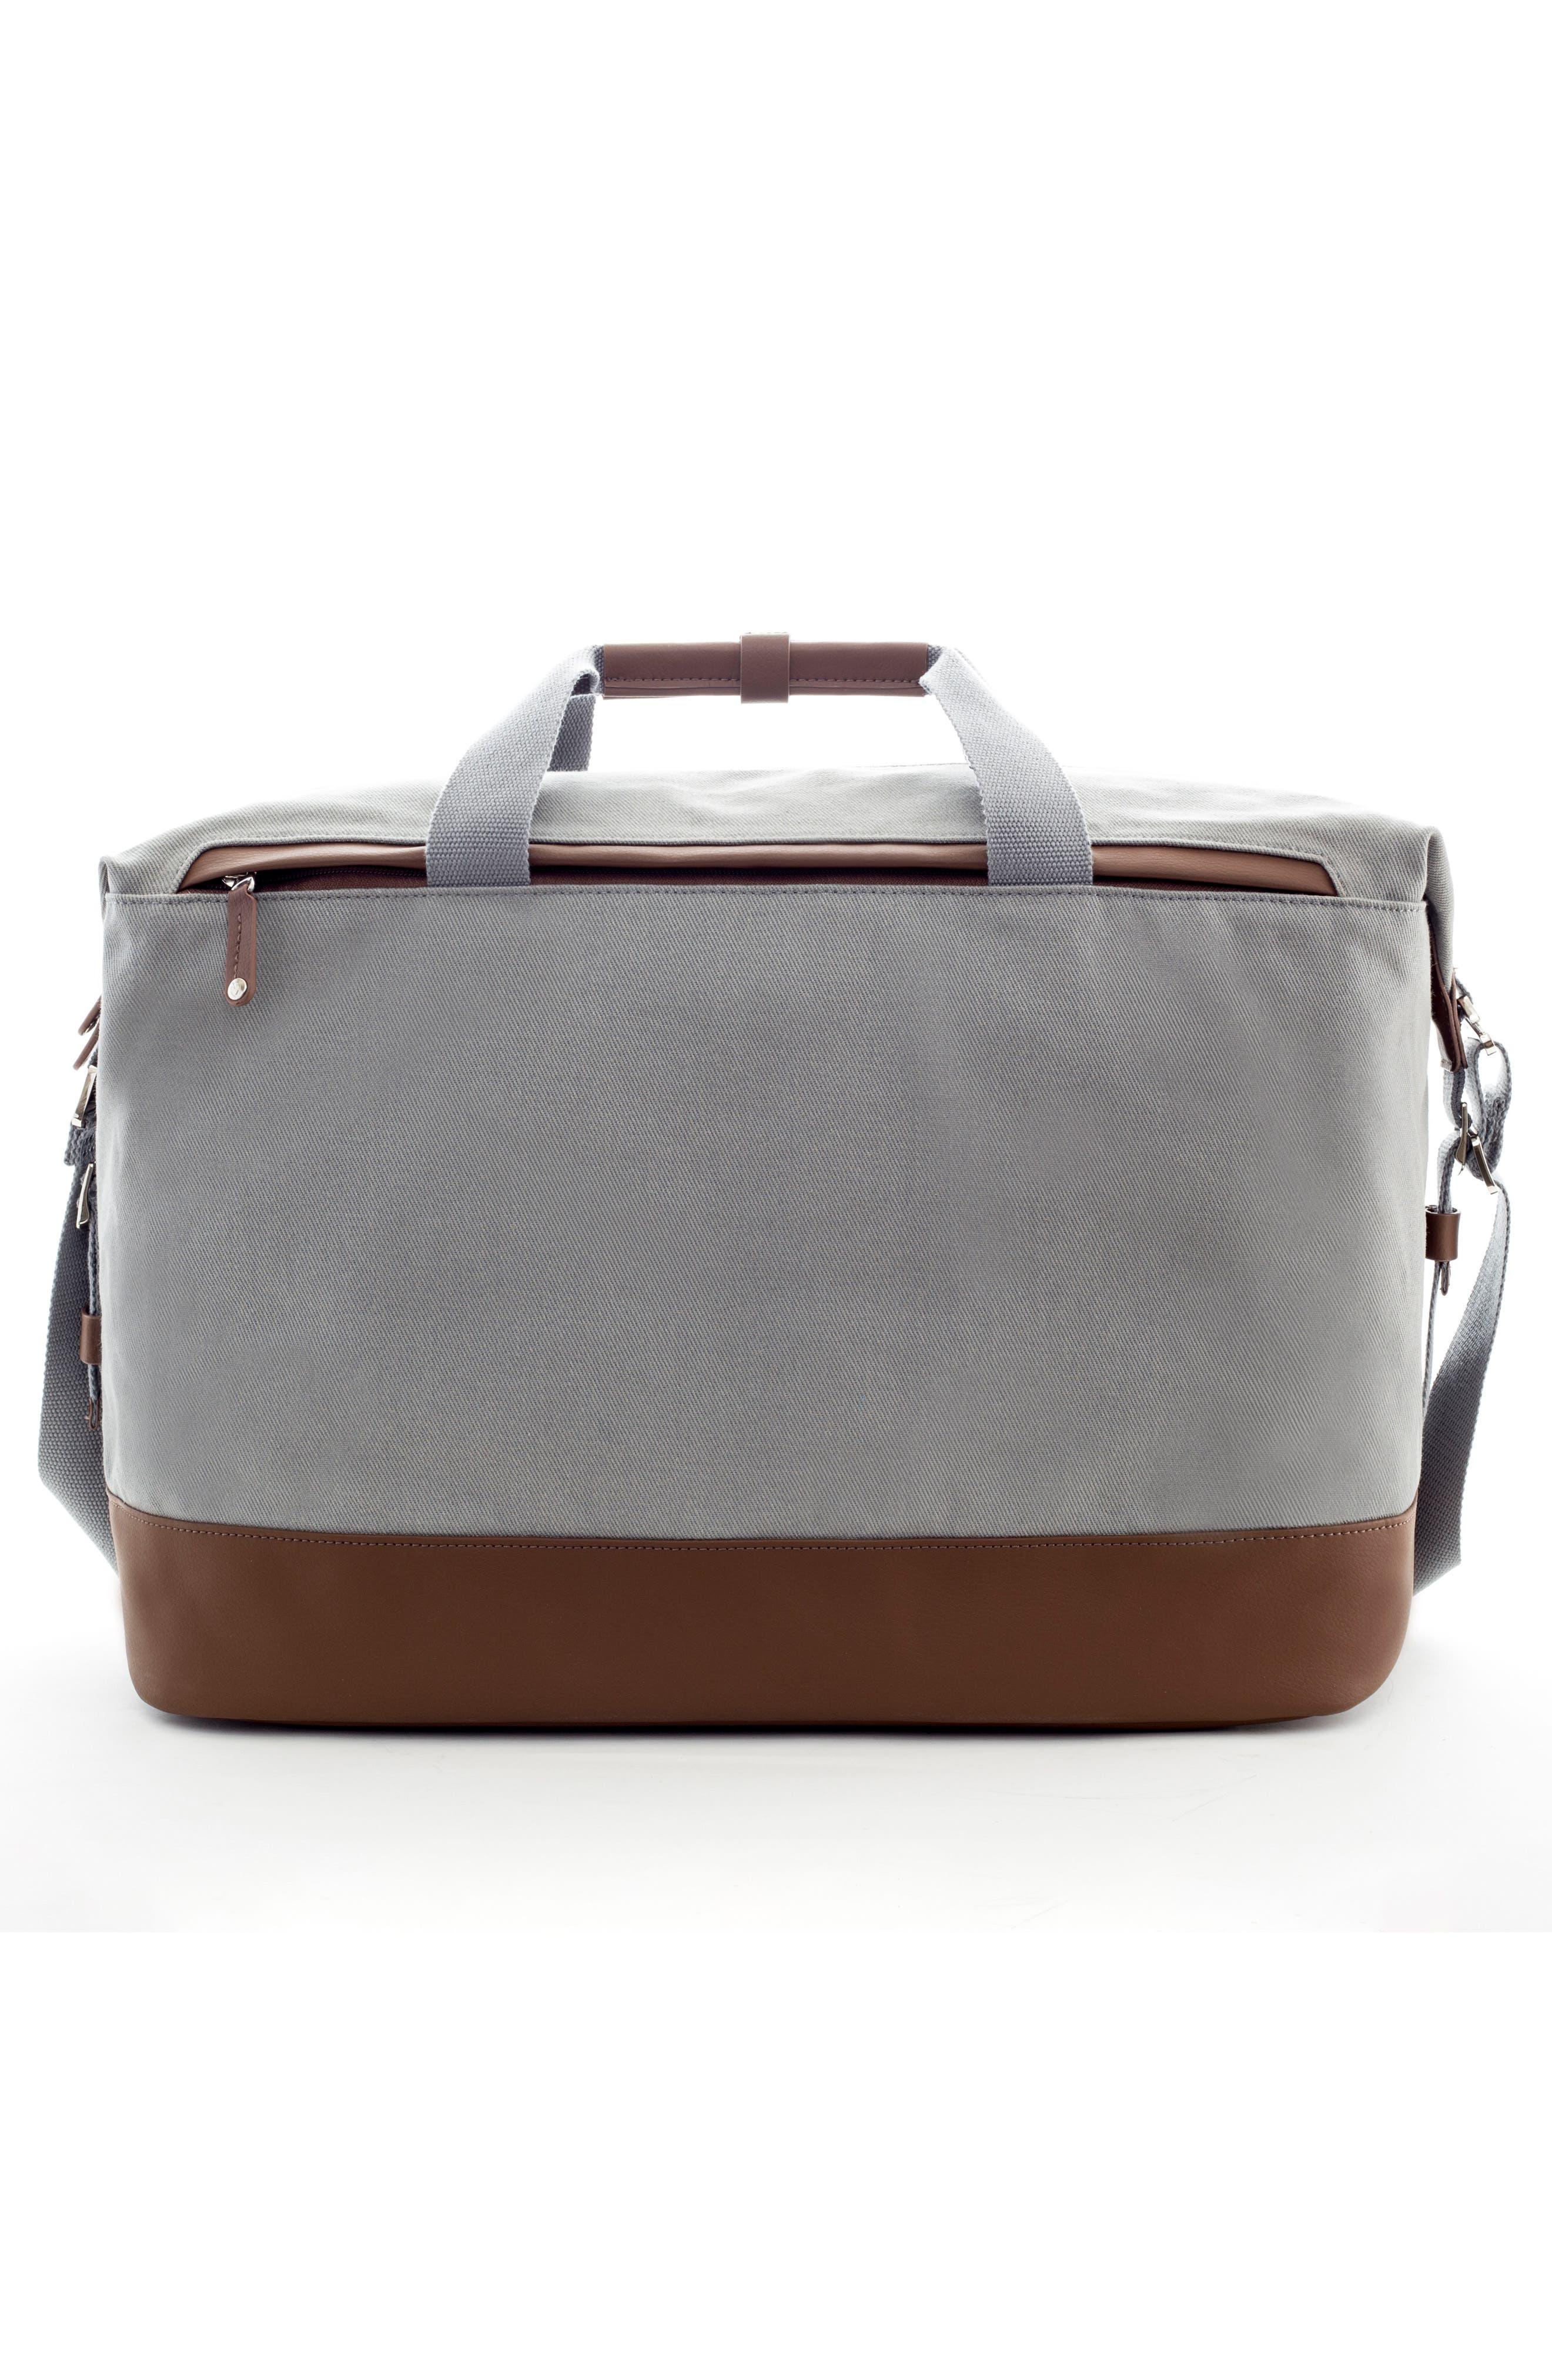 Refined Duffel Bag,                             Alternate thumbnail 2, color,                             Slate